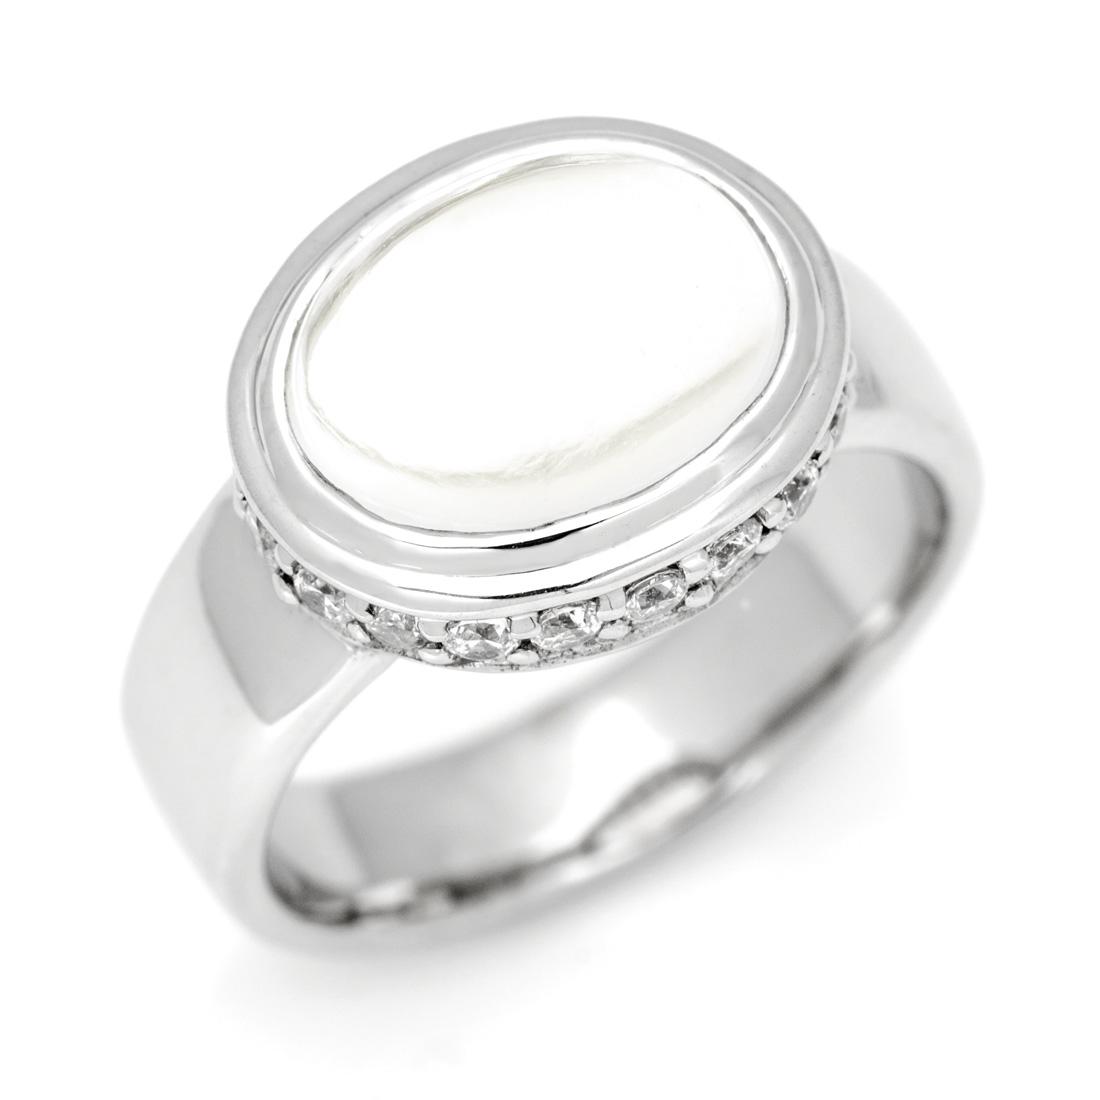 SV925 ムーンストーン シグニティキュービックジルコニア リング指輪 シルバー925 SILVER スターリングシルバー 誕生日 6月誕生石 刻印 文字入れ メッセージ ギフト 贈り物 ピンキーリング対応可能